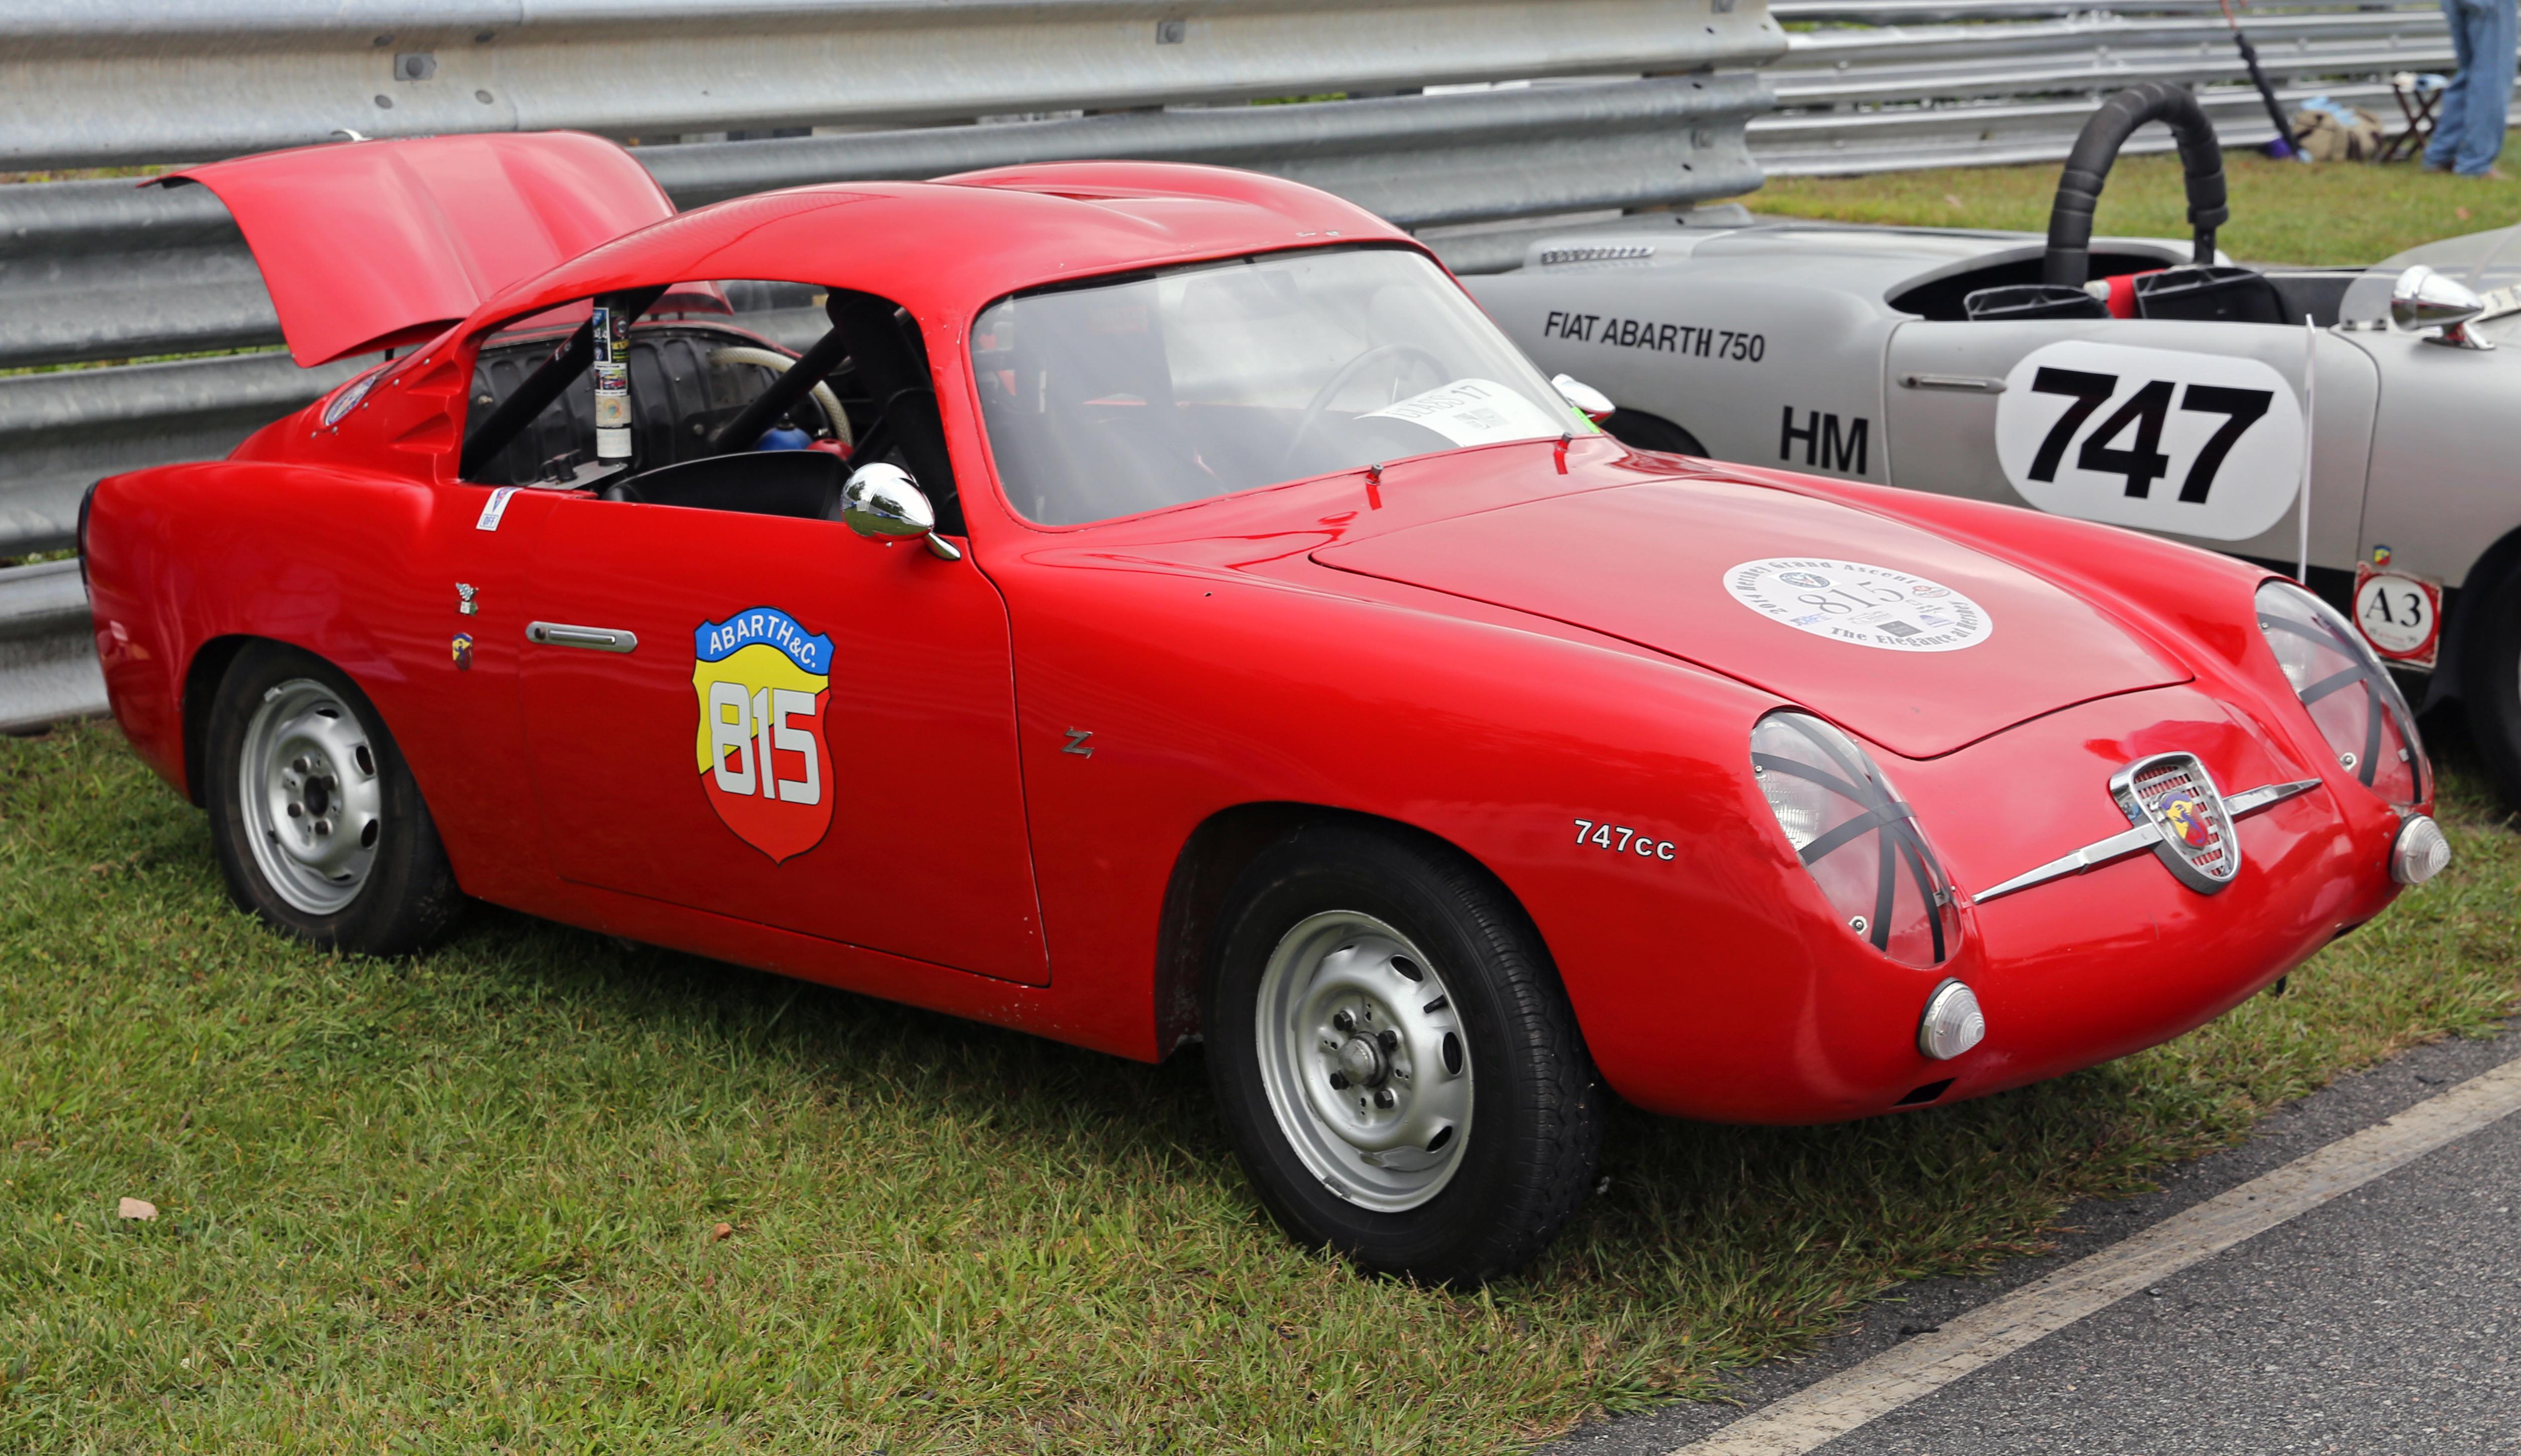 1959_Fiat-Abarth_750_GT_Zagato_racer.jpg